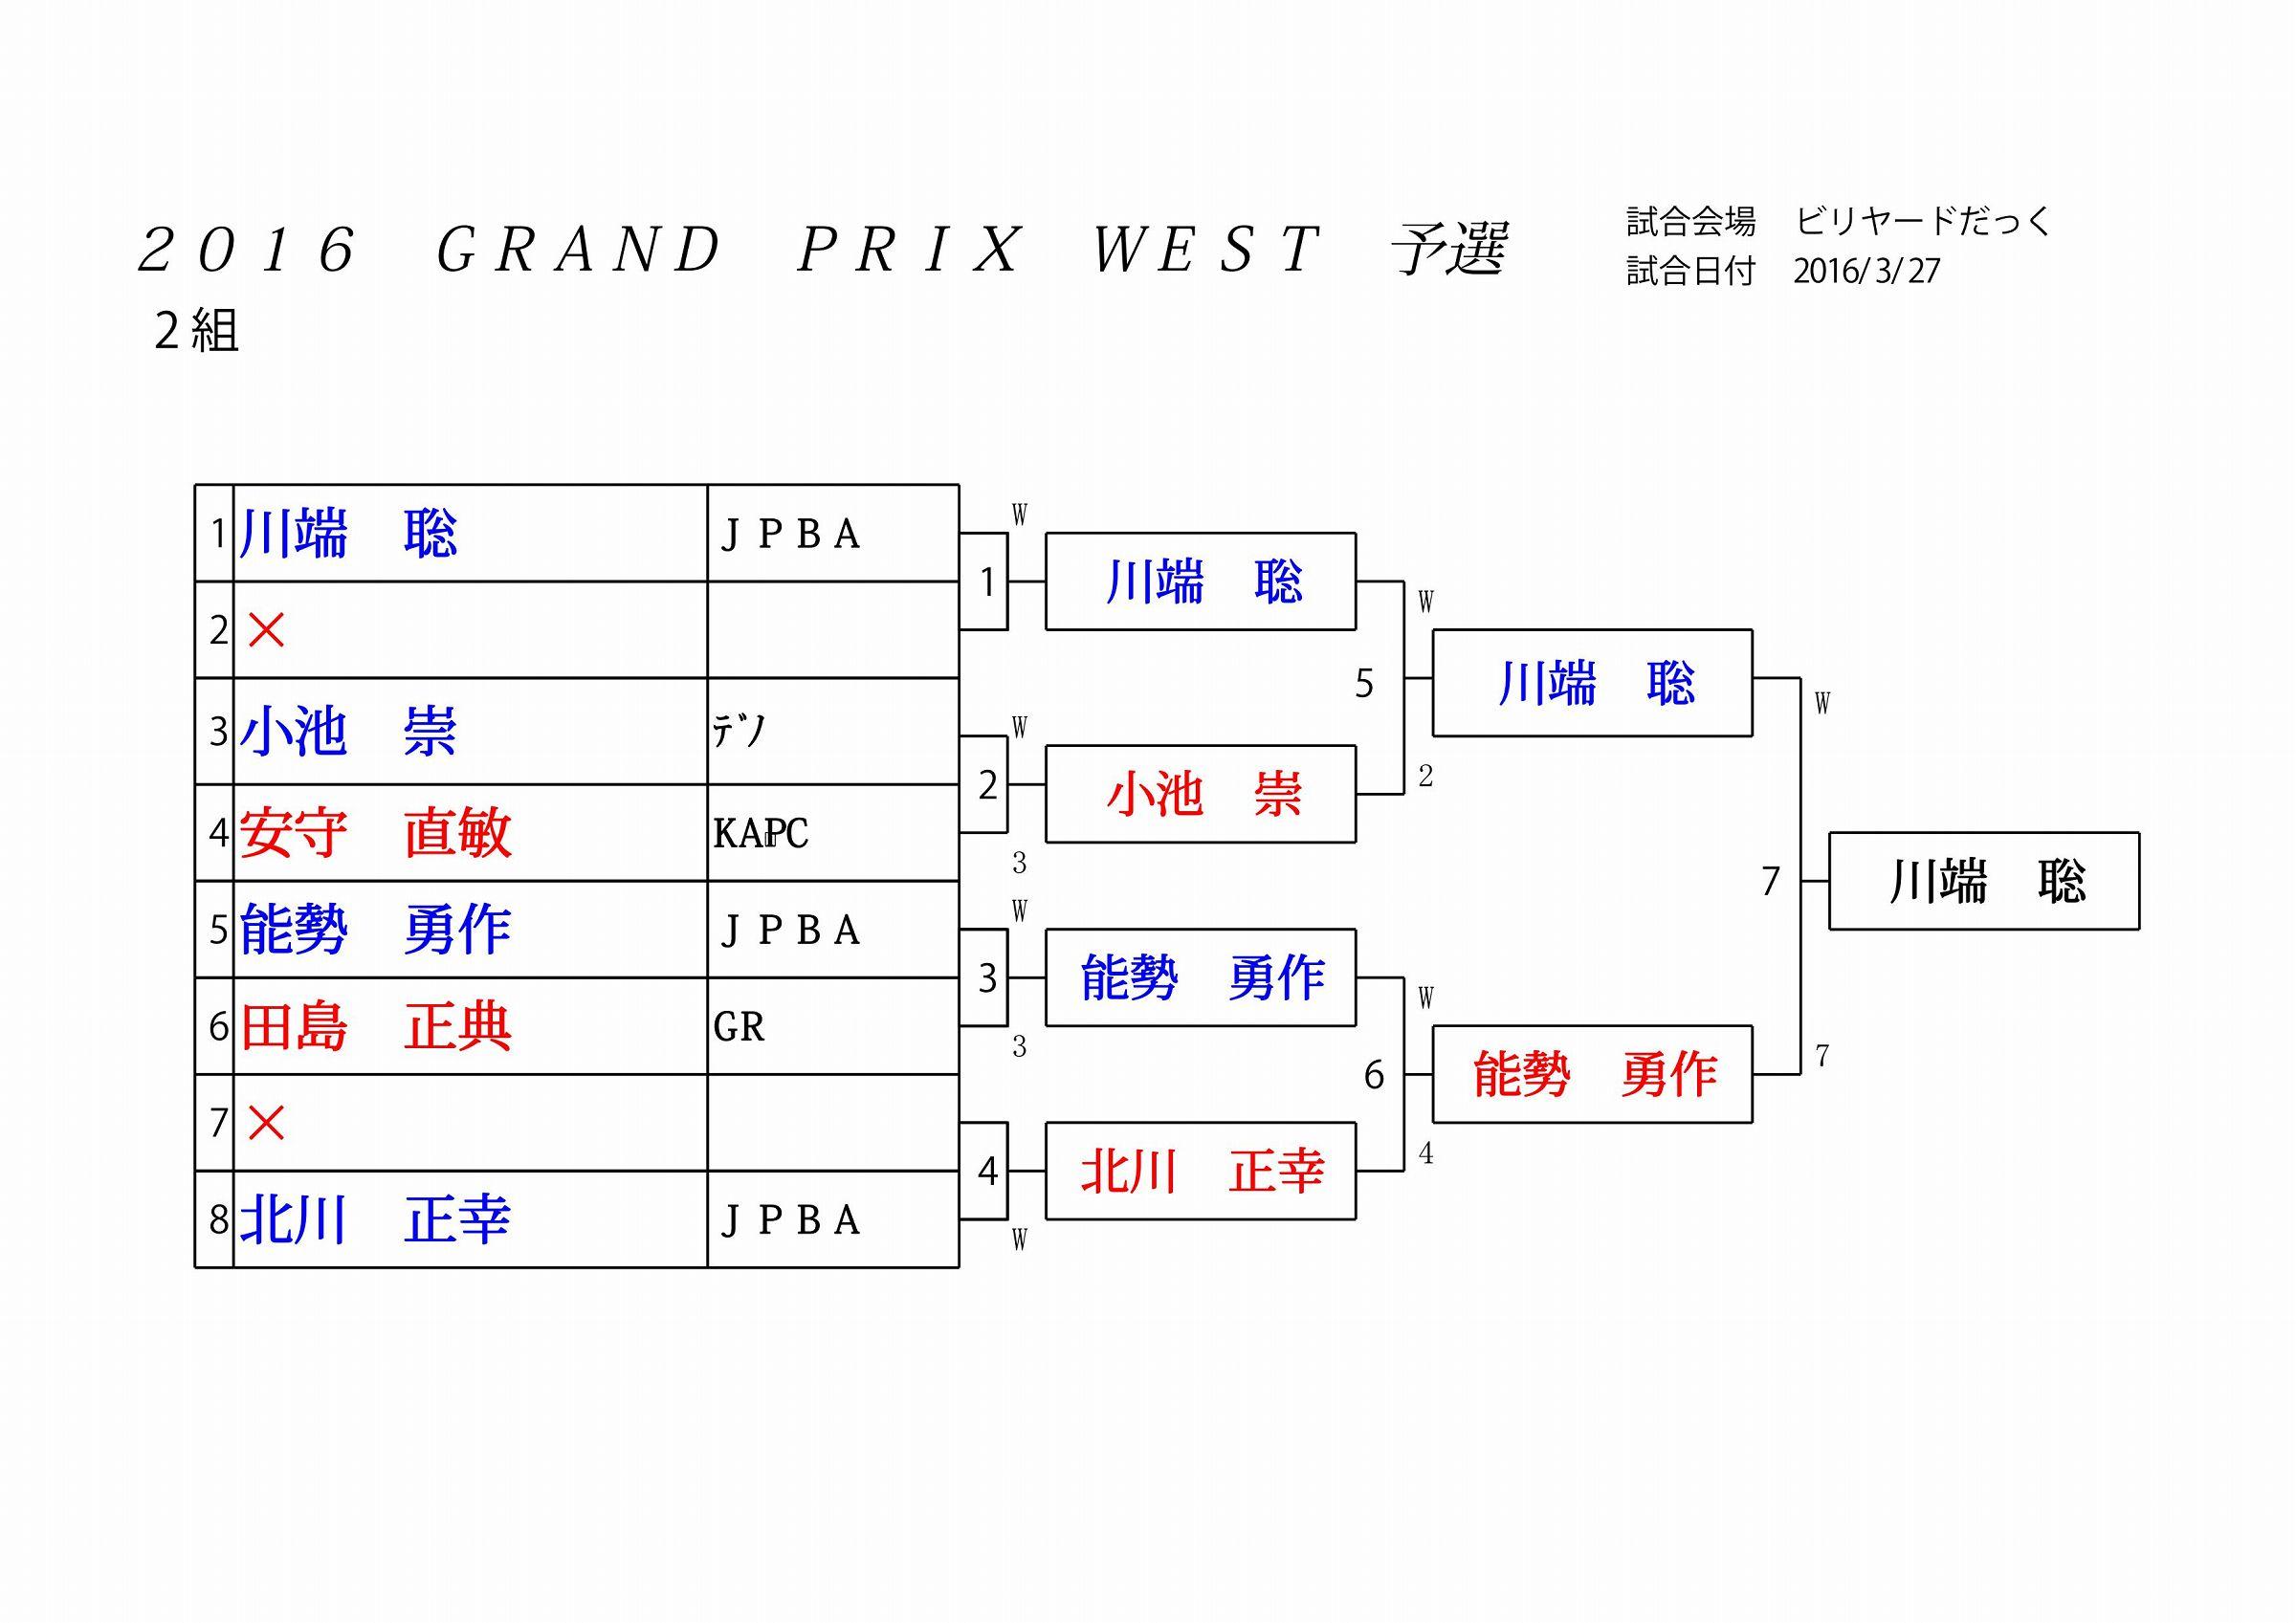 2016 GRAND PRIX WEST 予選_02